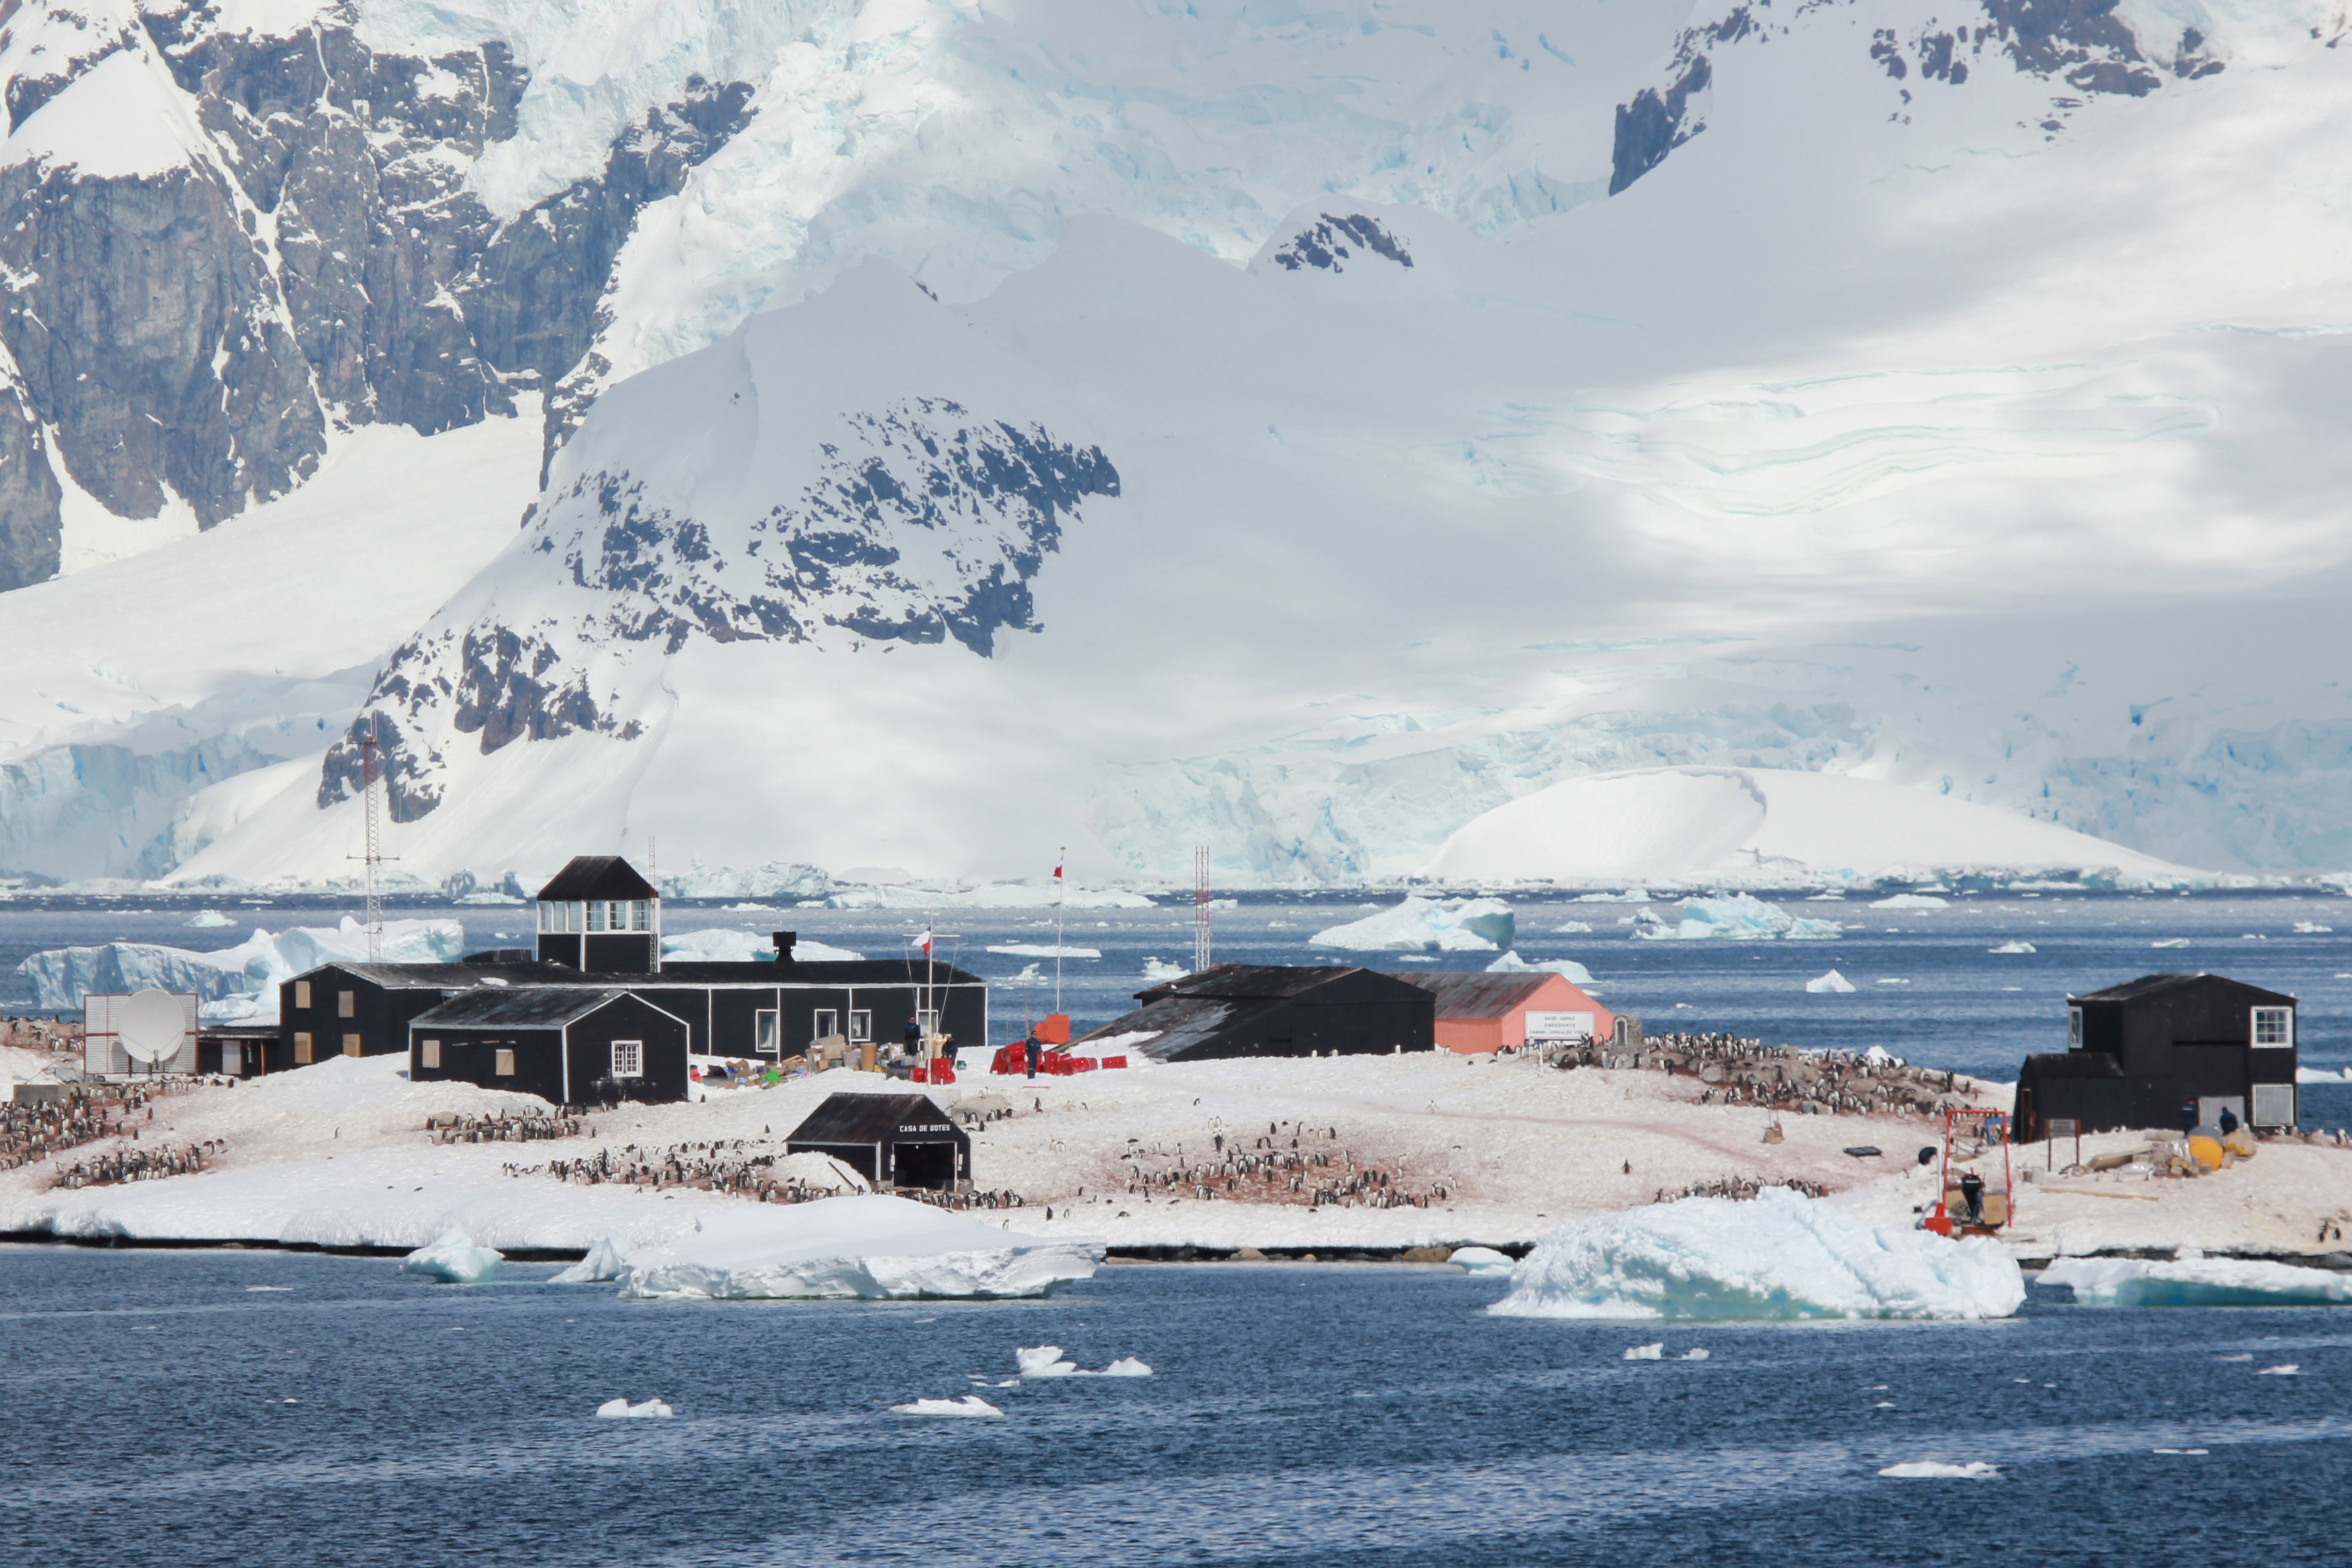 Presidente Gabriel Gonzalez Videla Base - Chile, Antarctic Peninsula